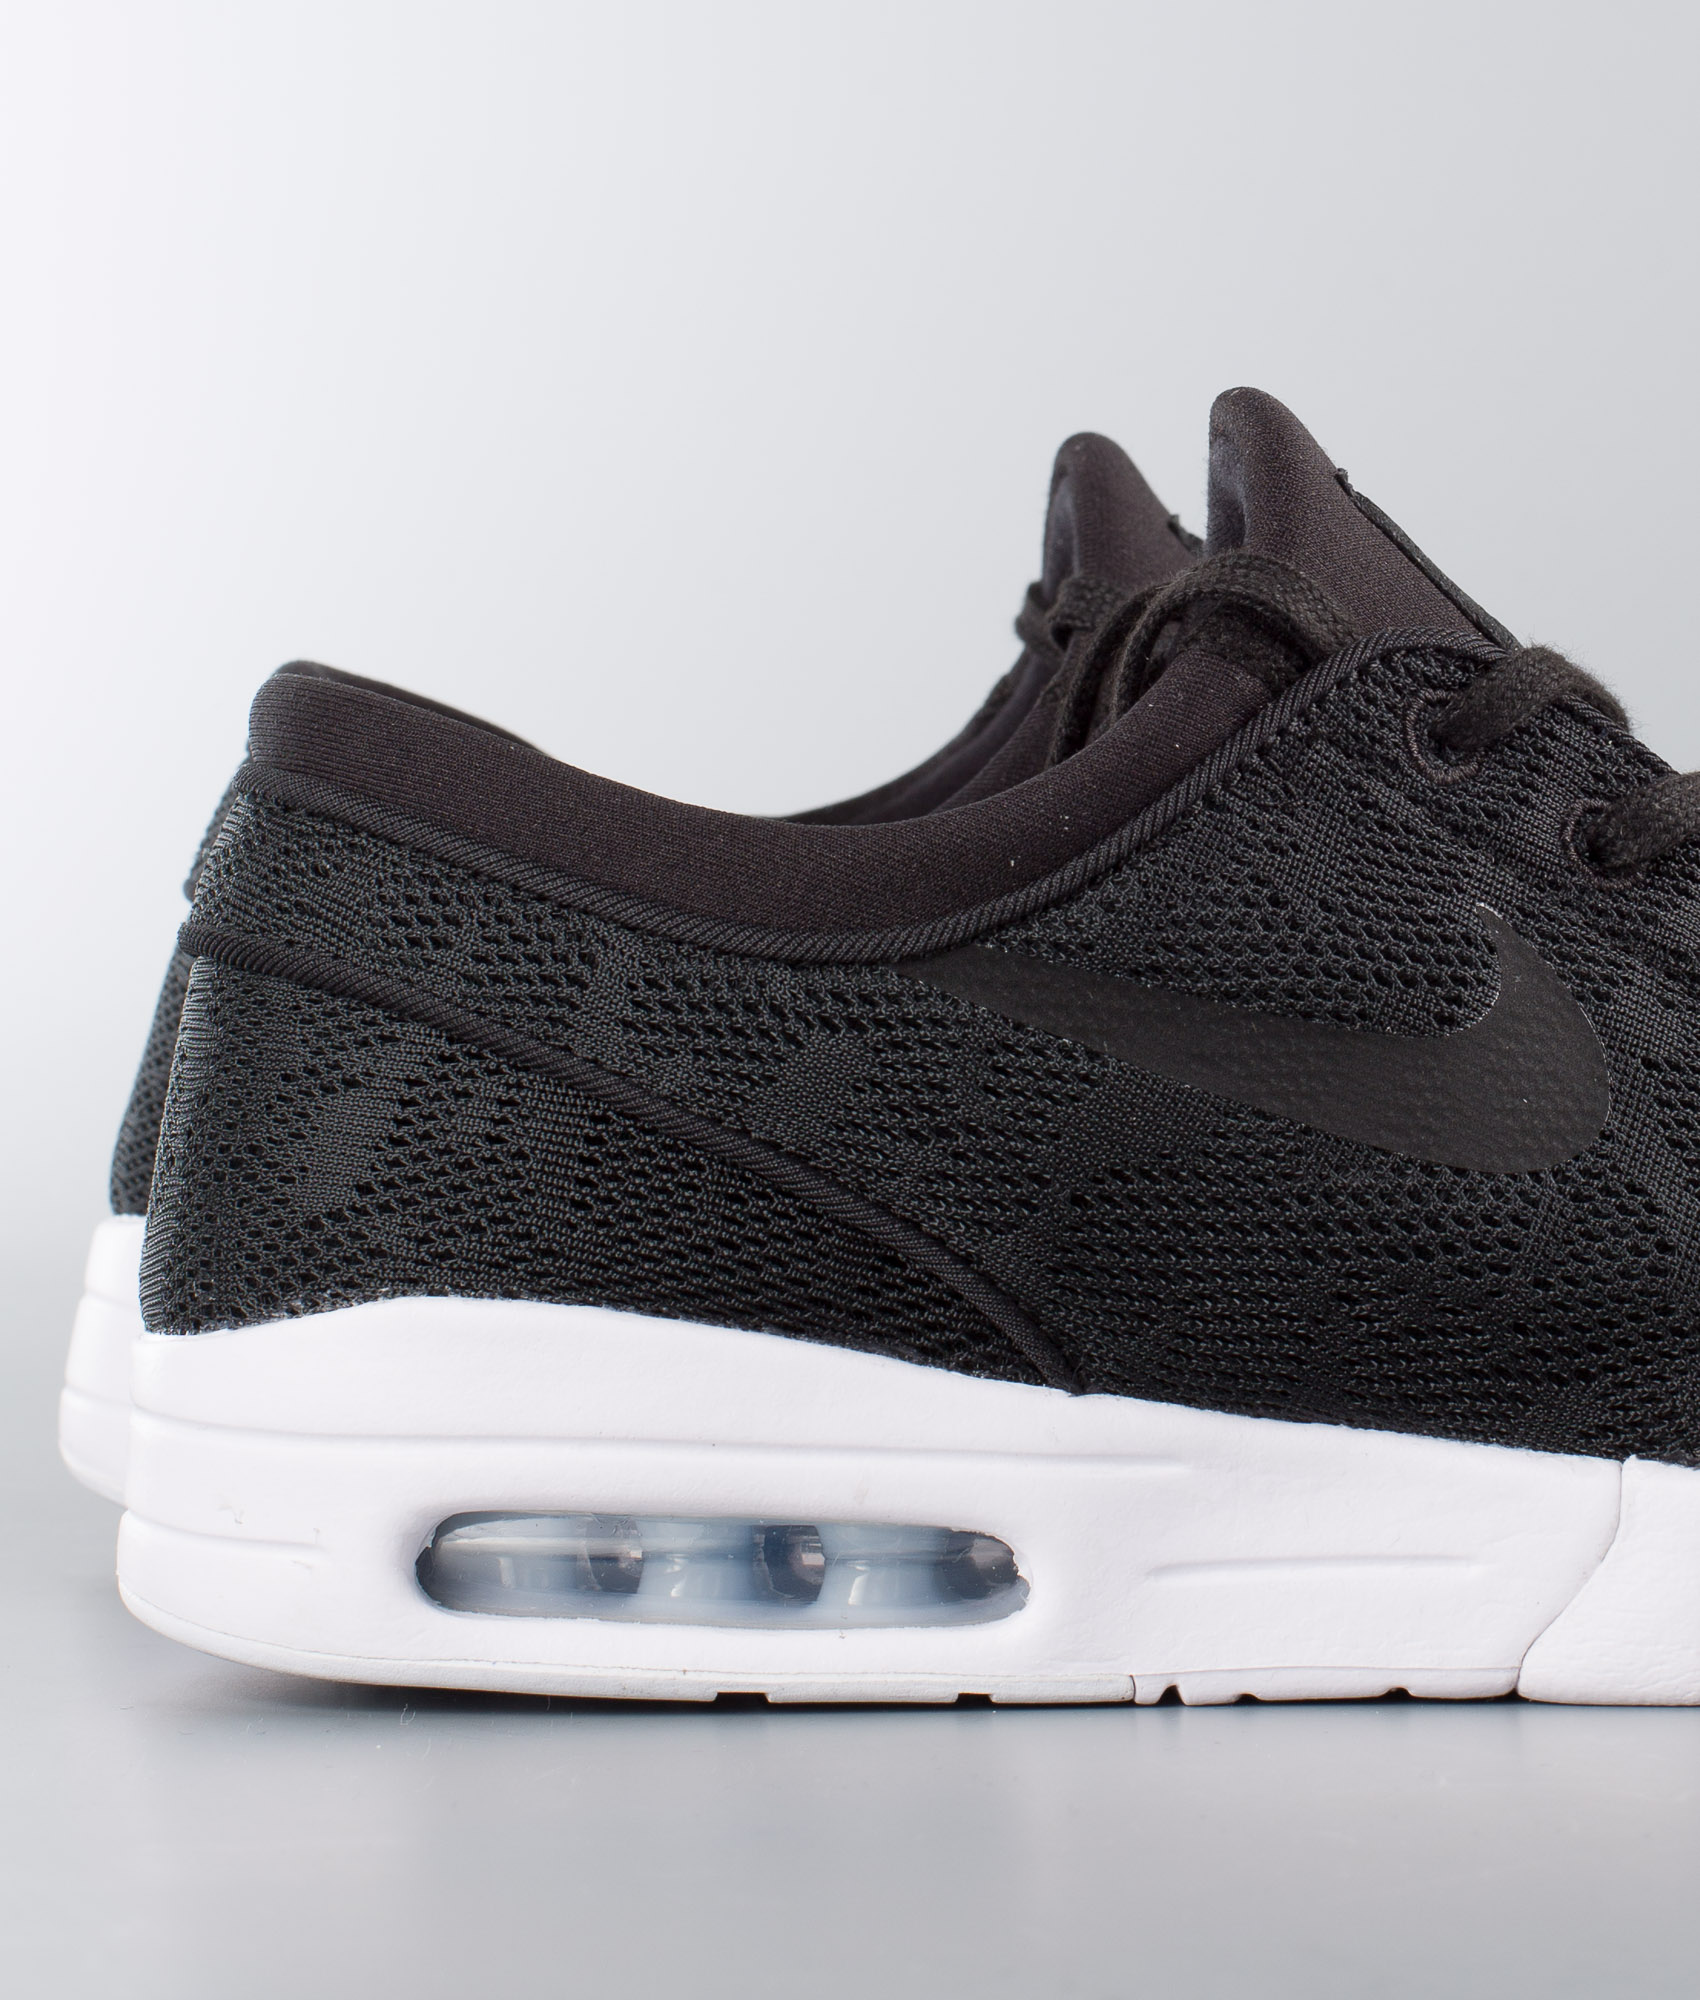 Chaussures Chez Max Janoski White Blackblack NikeStefan De OmwvN8n0